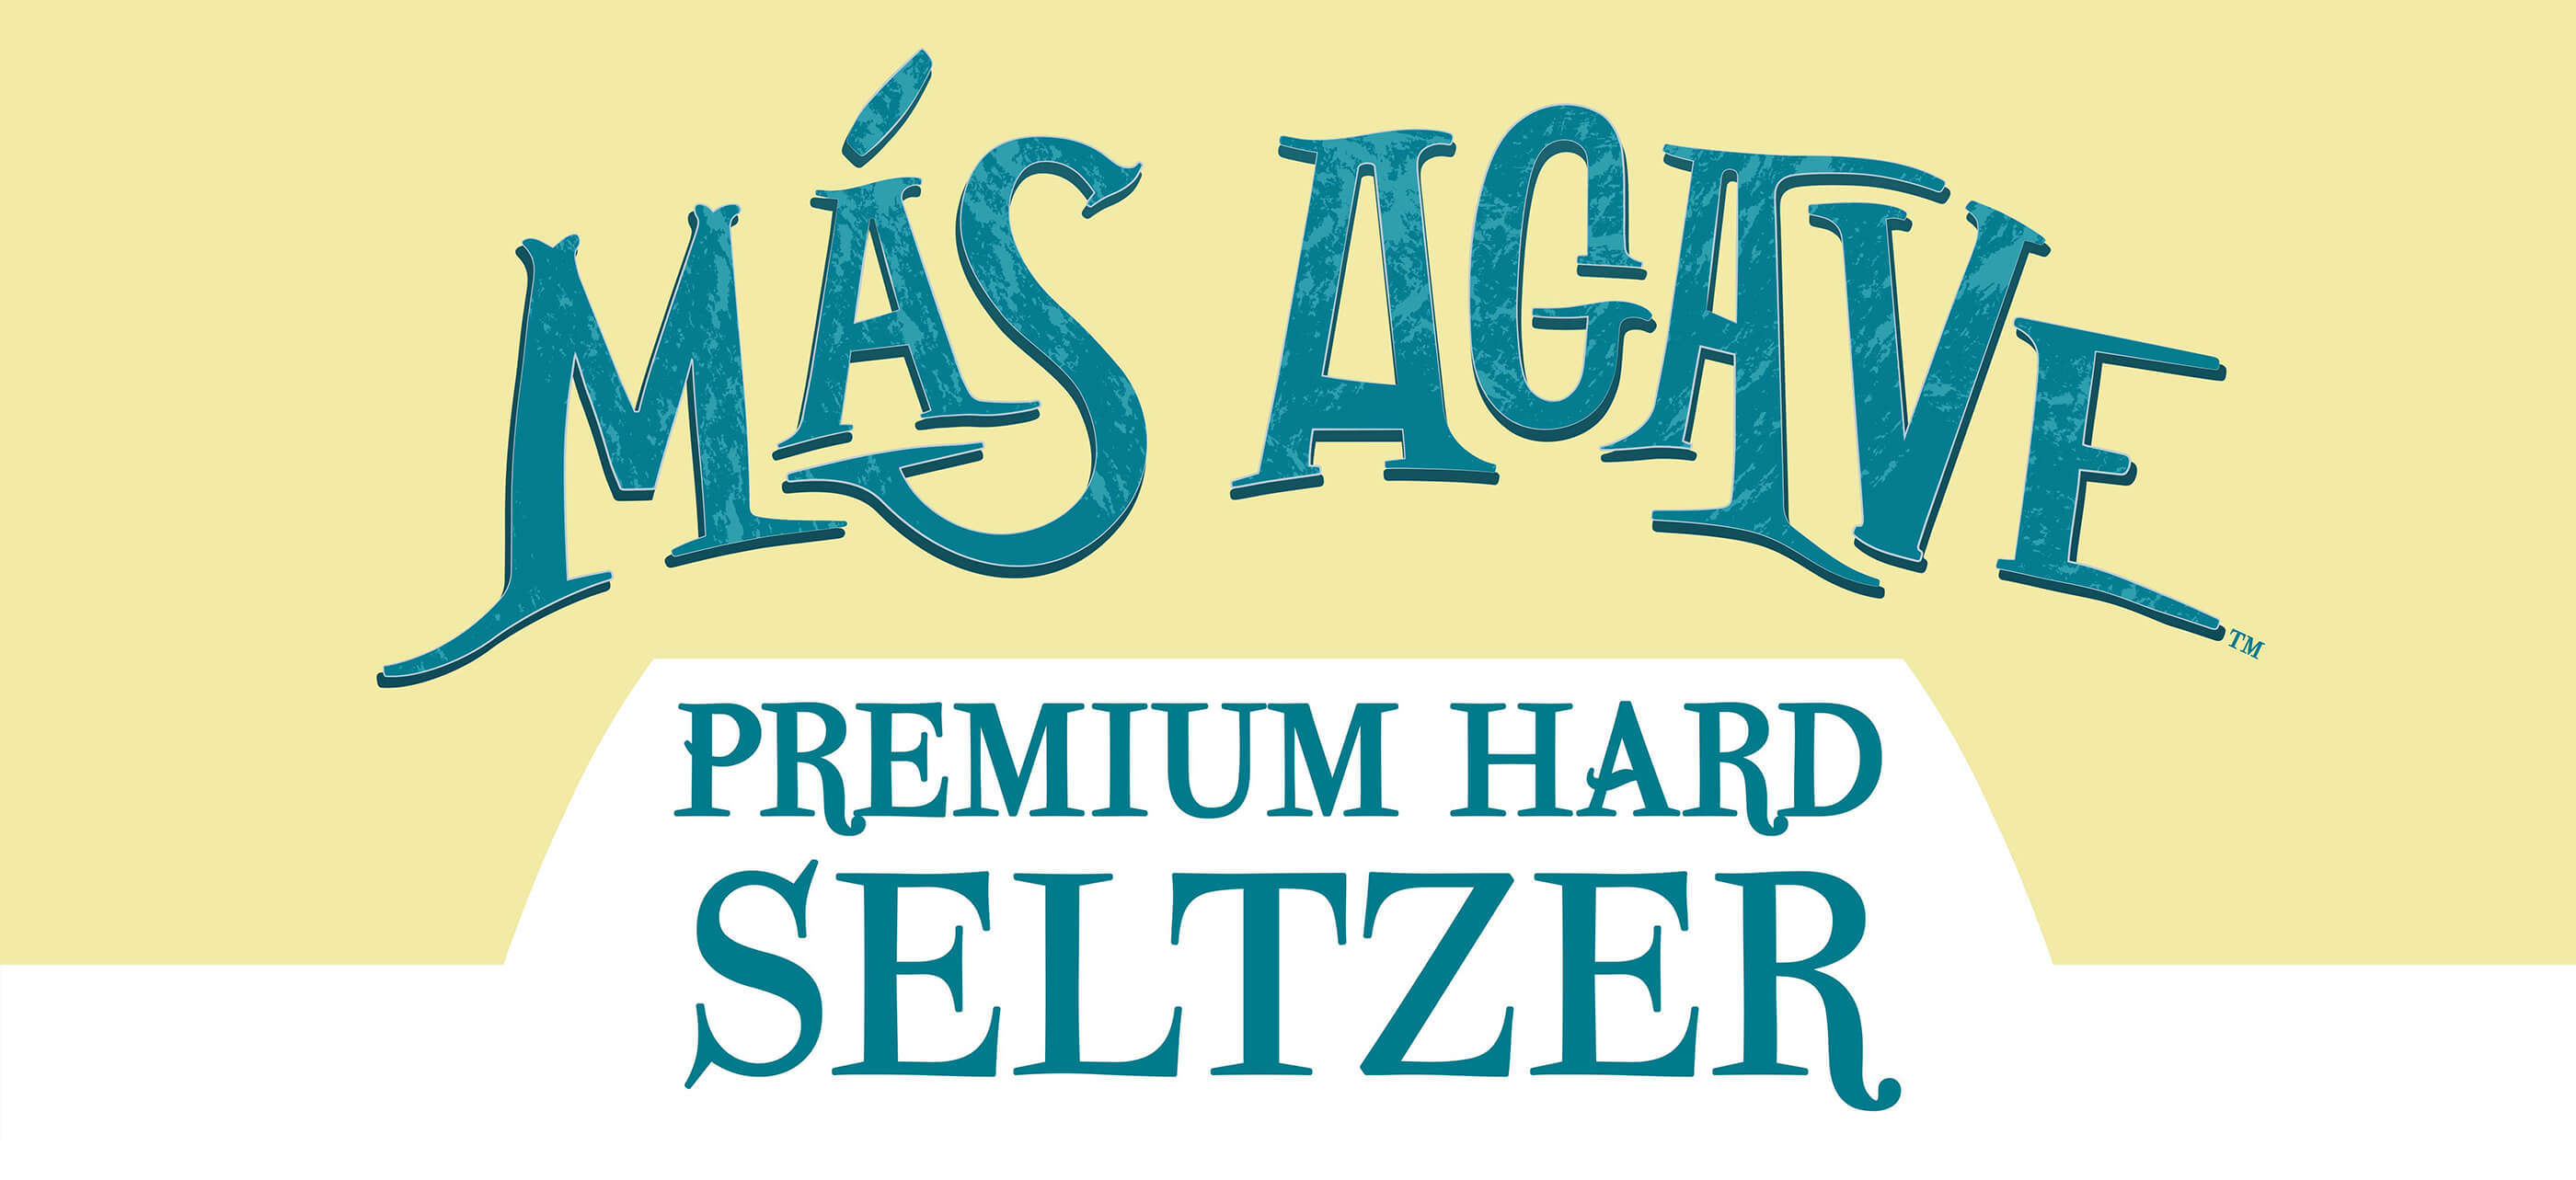 mas agave premium hard seltzer banner